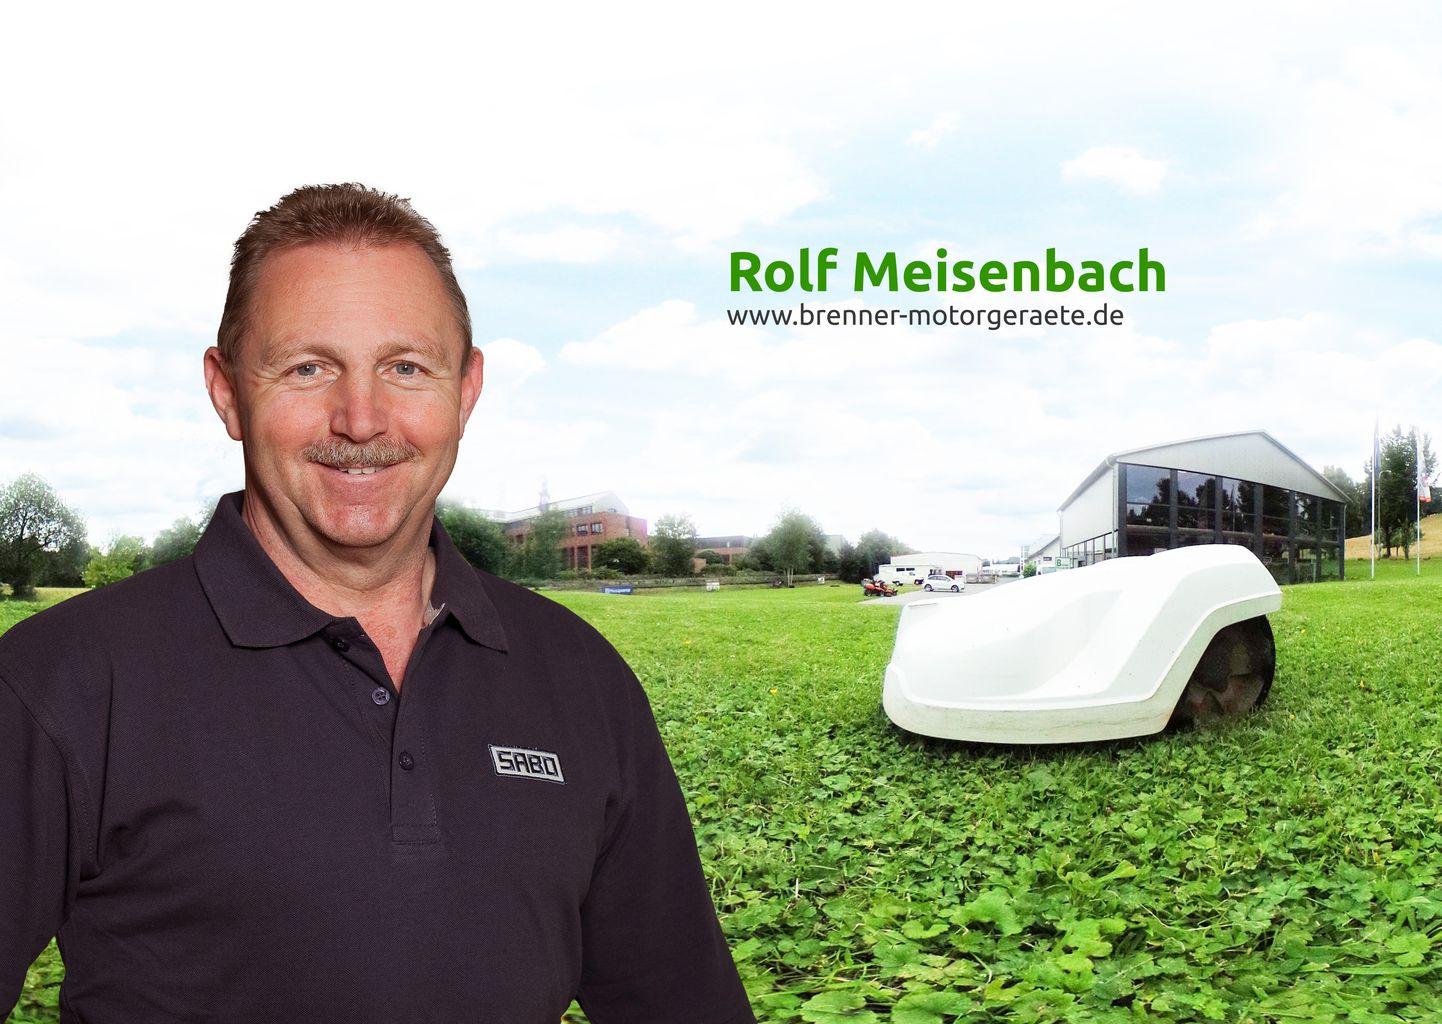 Christian Brenner – Brenner Motorgeräte  brenner-motorgeraete-rolf-meisenbach-vorstellung_thumb.jpg